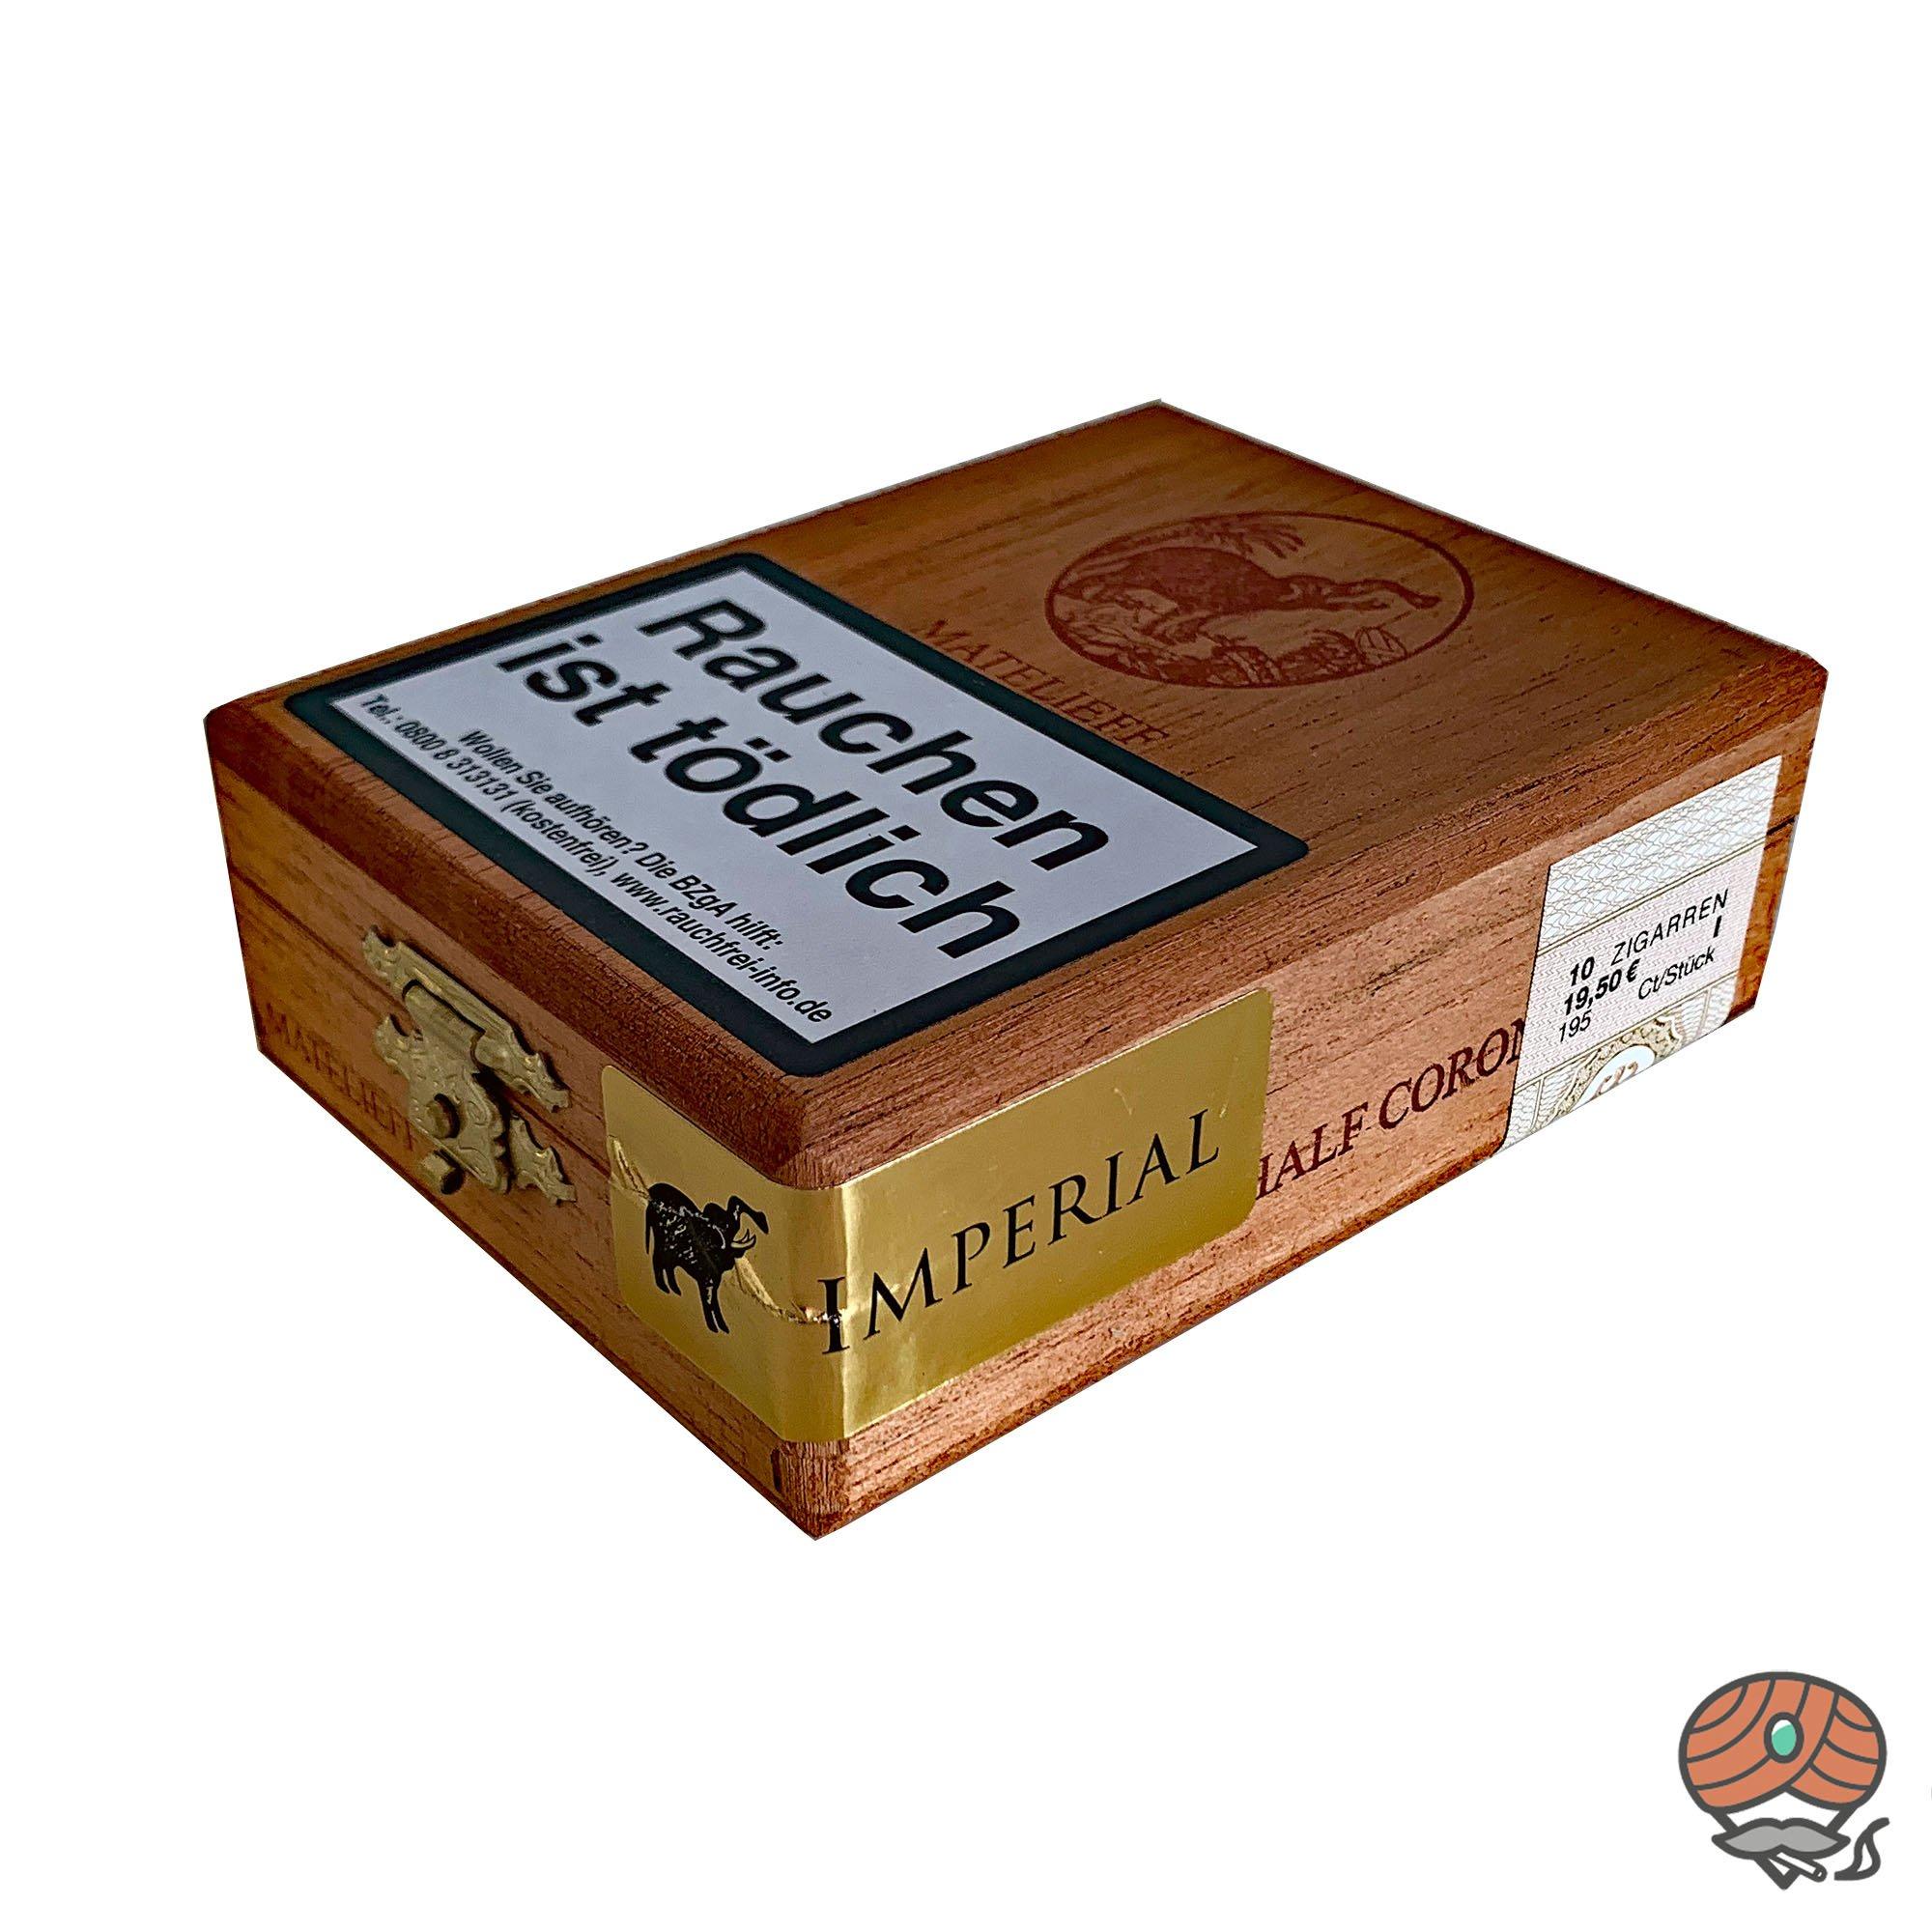 De Olifant Classic Matelieff Zigarren